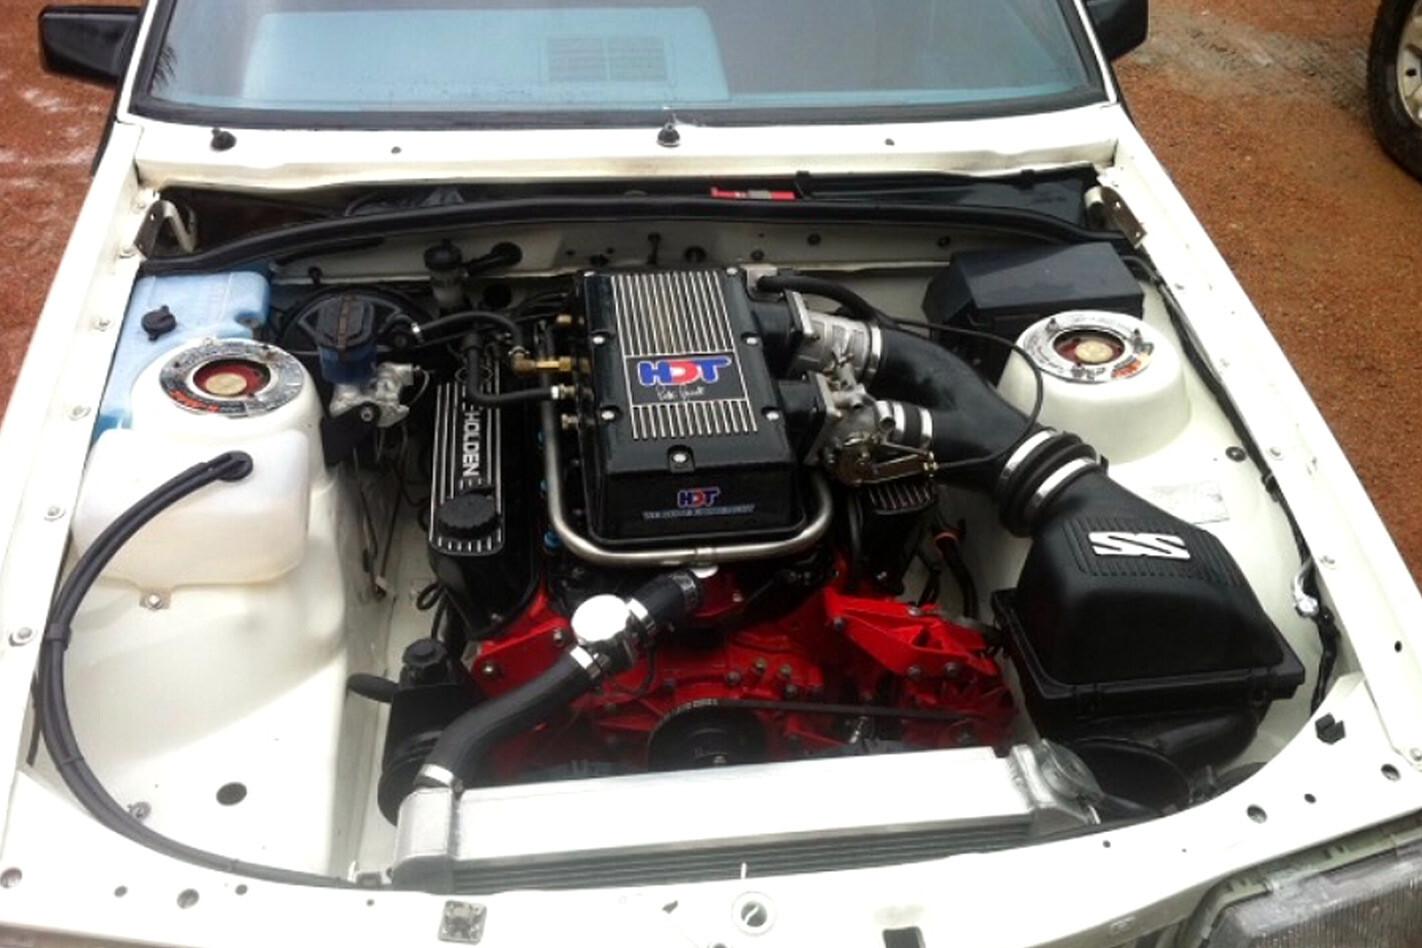 HDT engine bay